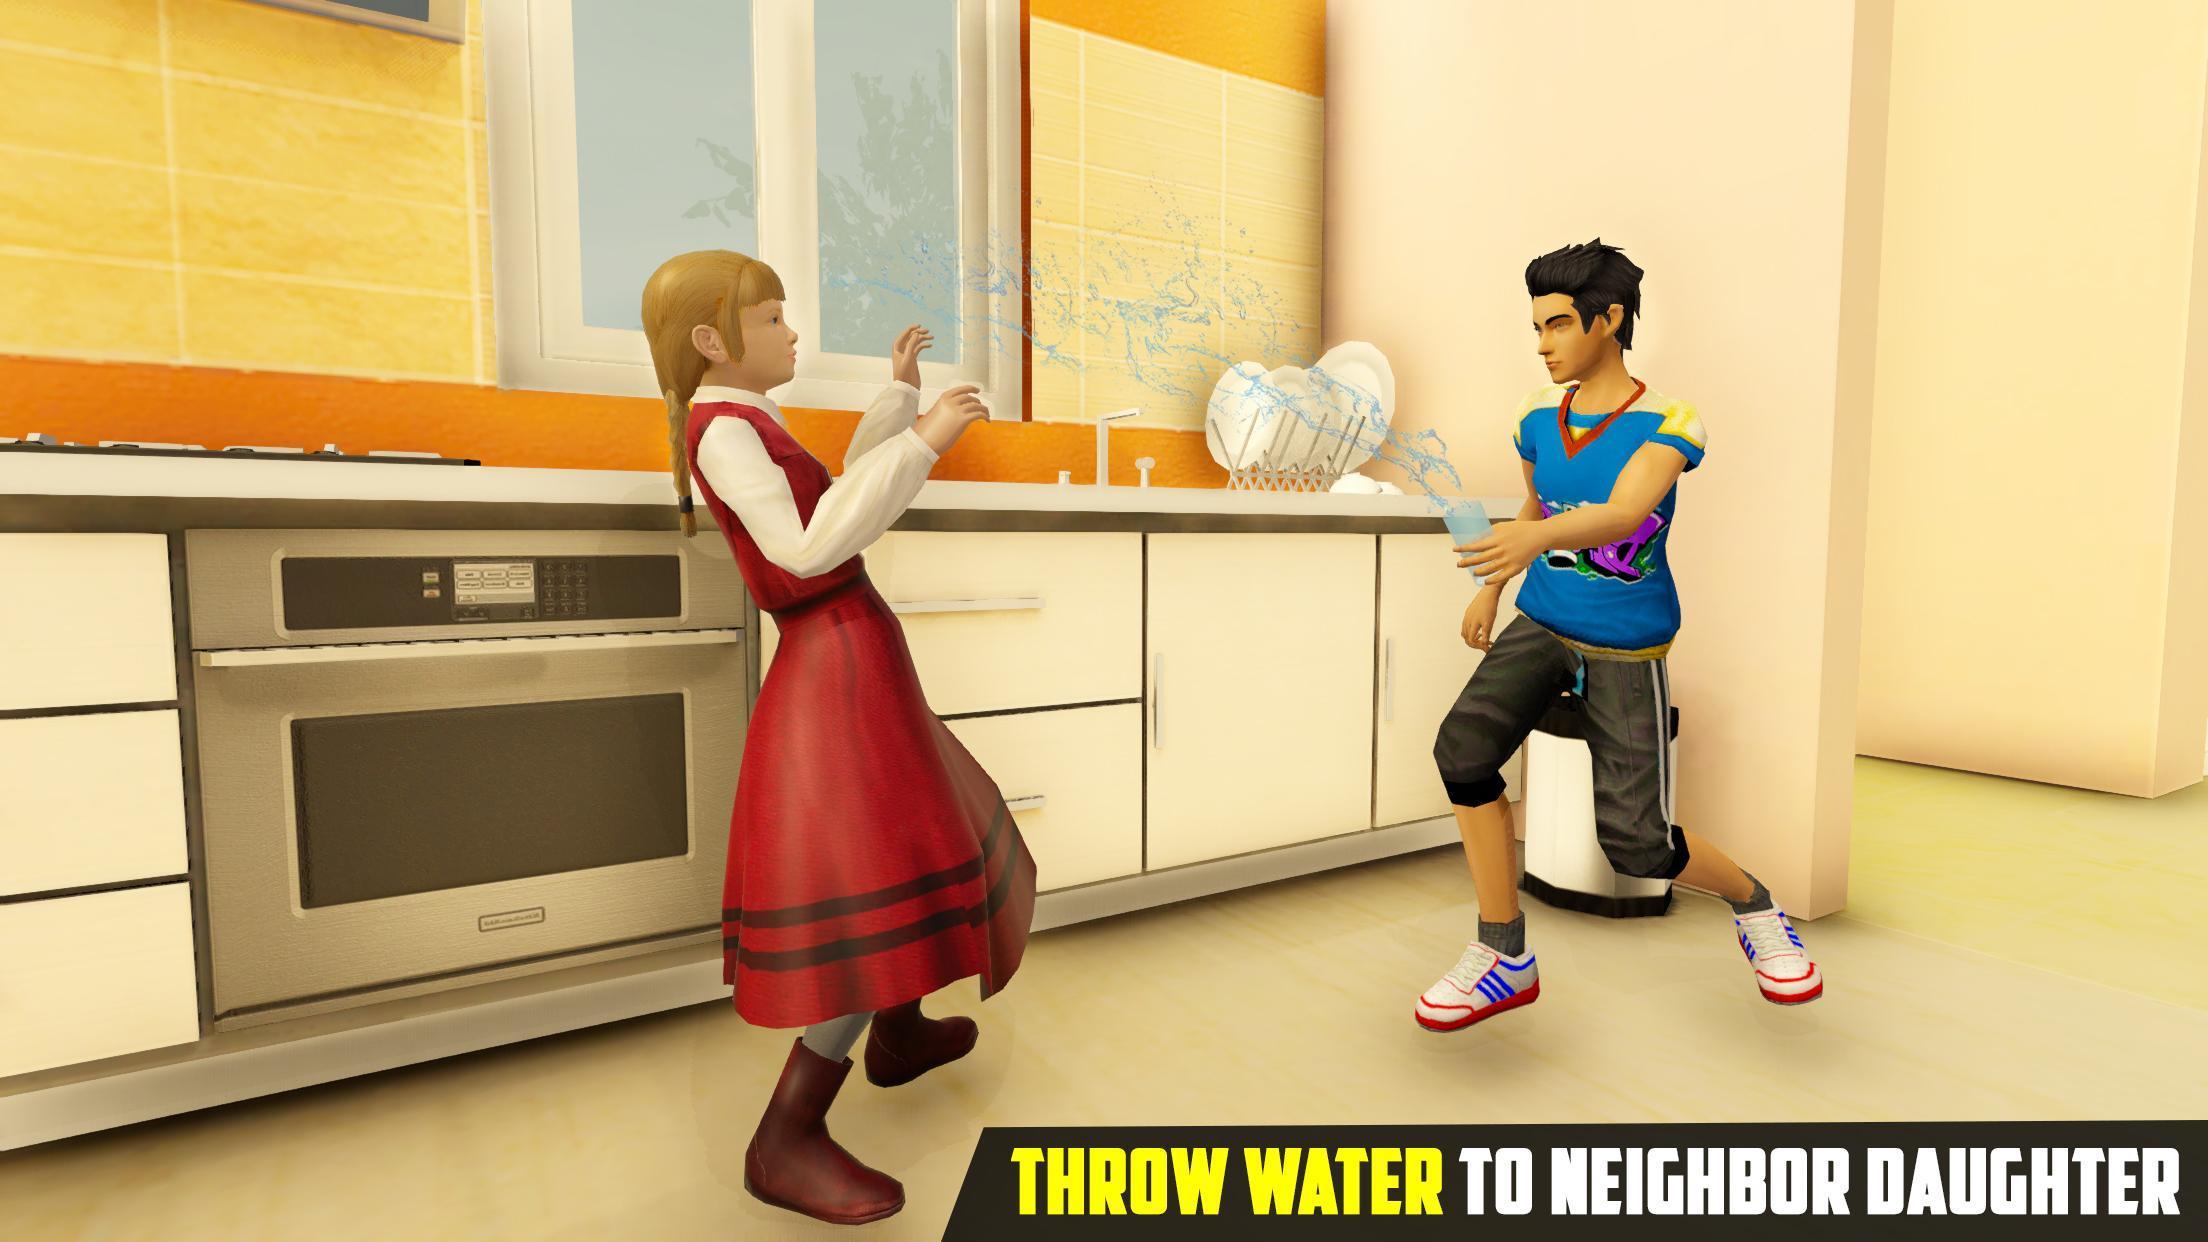 Virtual Bully Boys Next Angry Neighbor 1.4 Screenshot 13